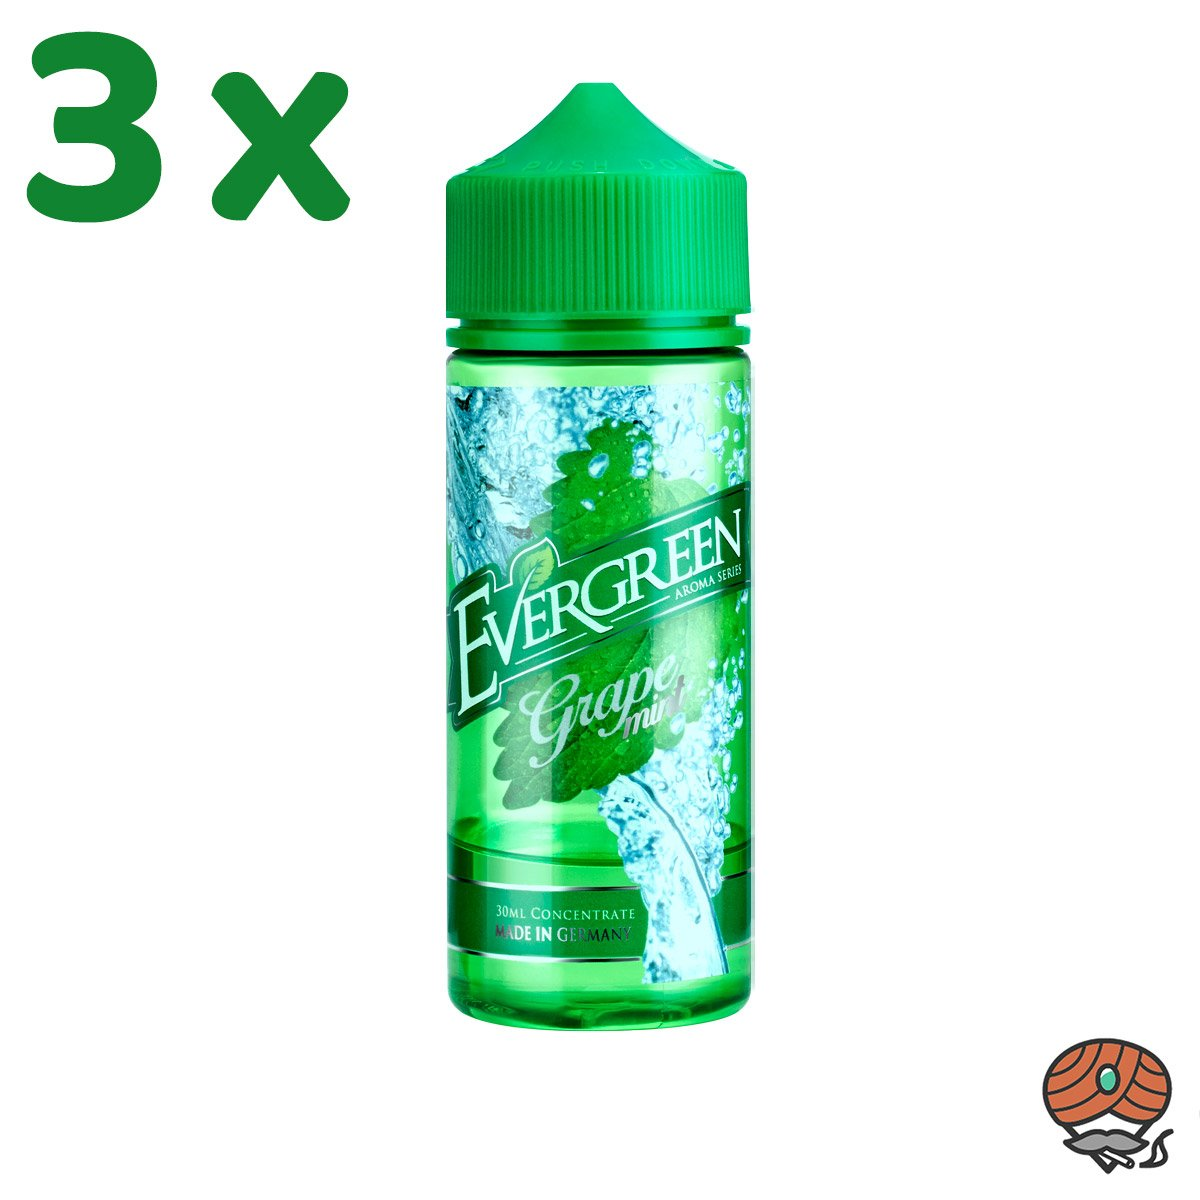 3 x Grape Mint Evergreen Aroma à 30 ml